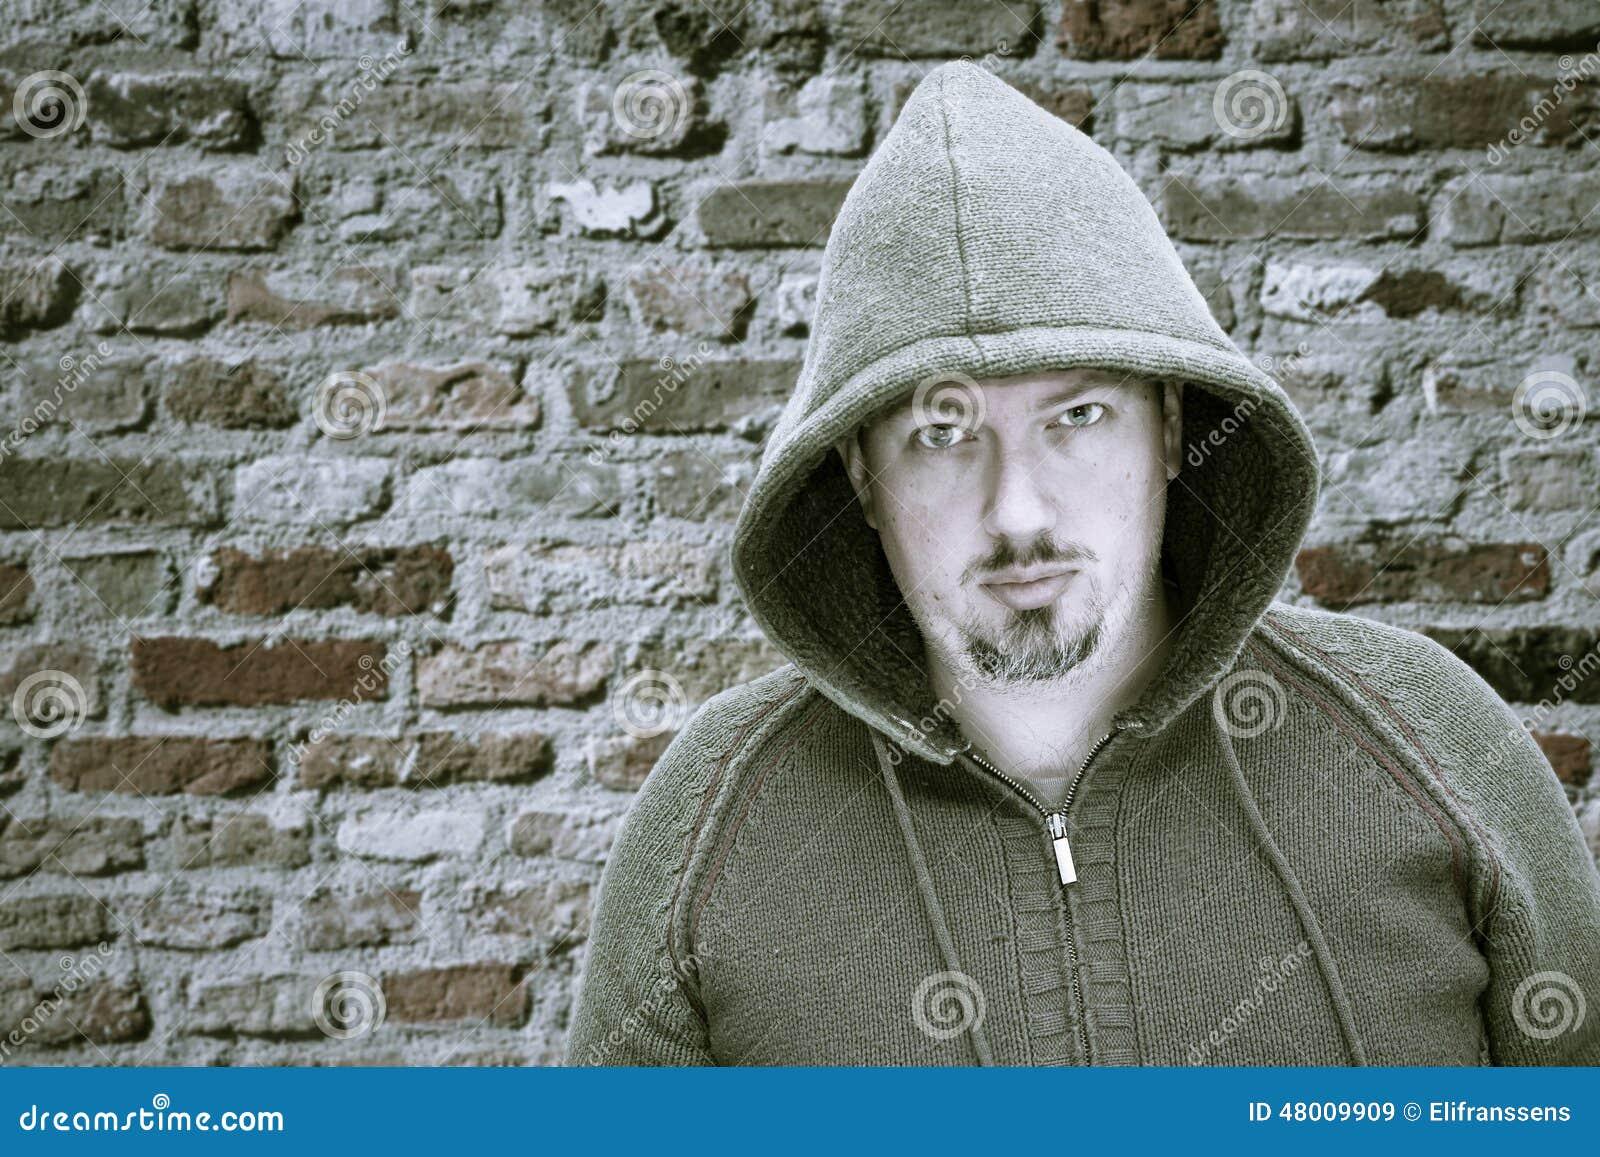 Scary Stalker Stock Photo - Image: 48009909